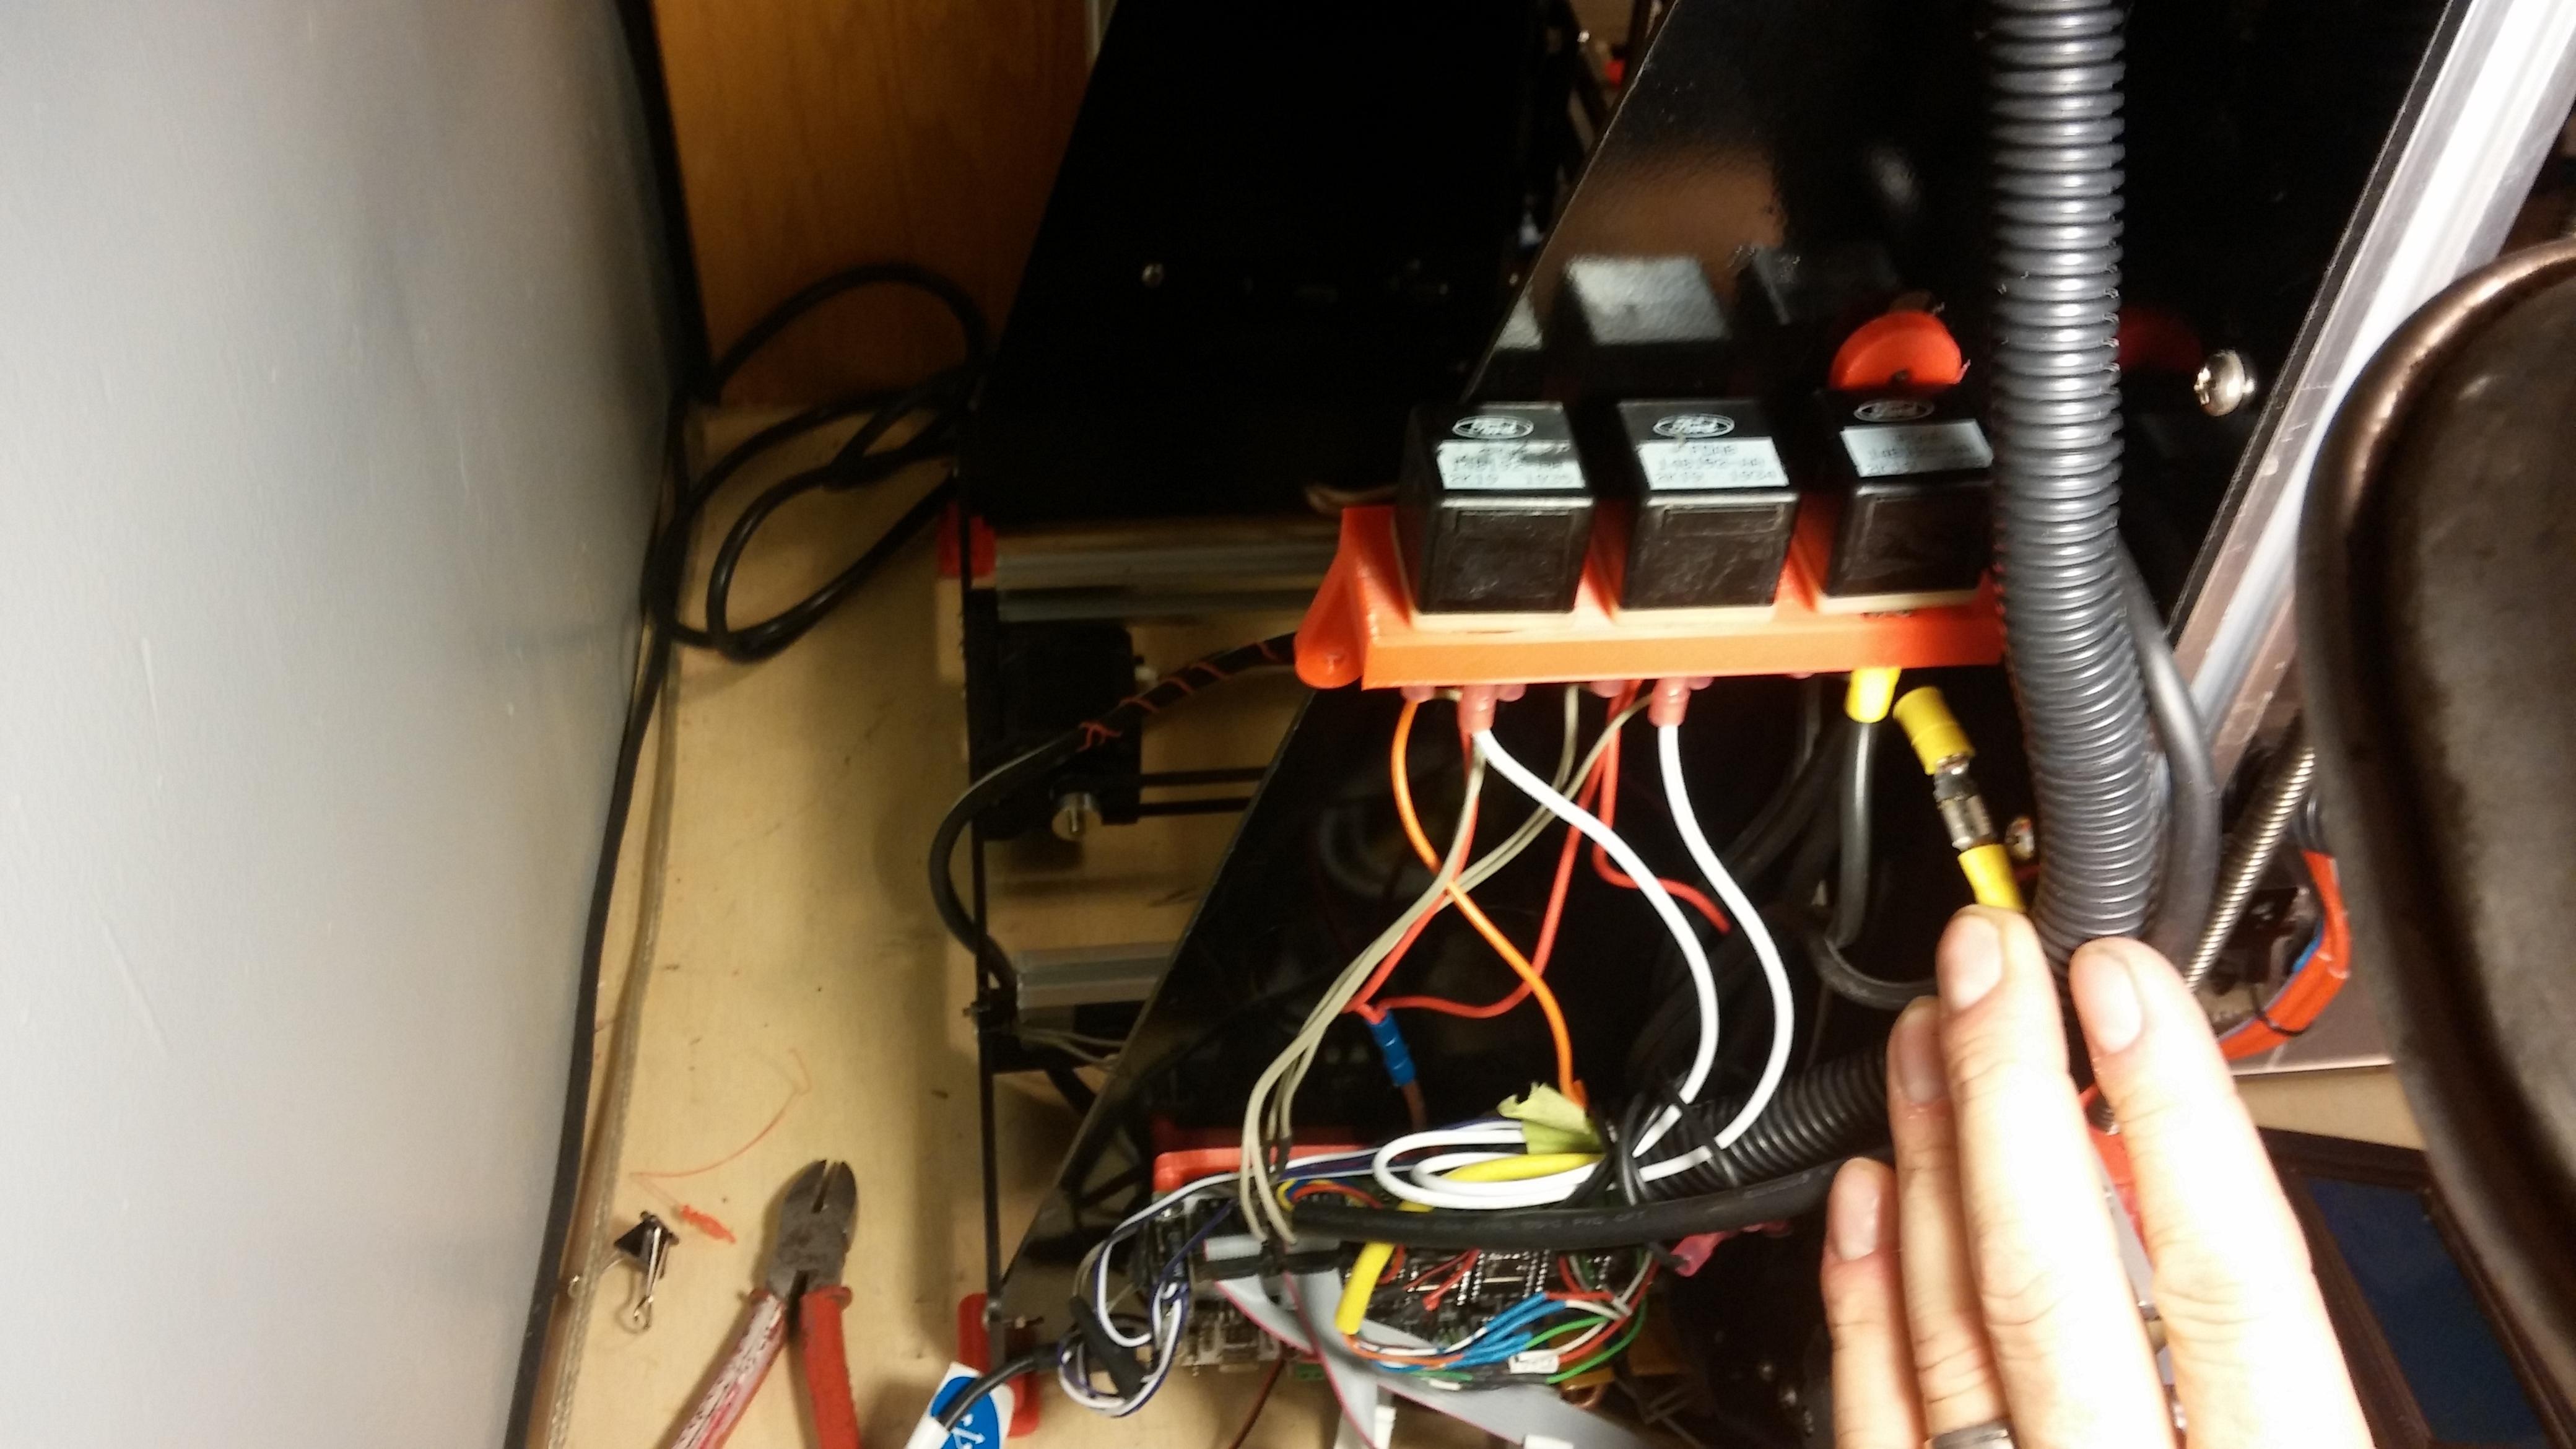 1011151913a.jpg Download free STL file NCS P3-v Steel Three Relay Mount for NCS P3-v Steel • 3D printer model, trentjw